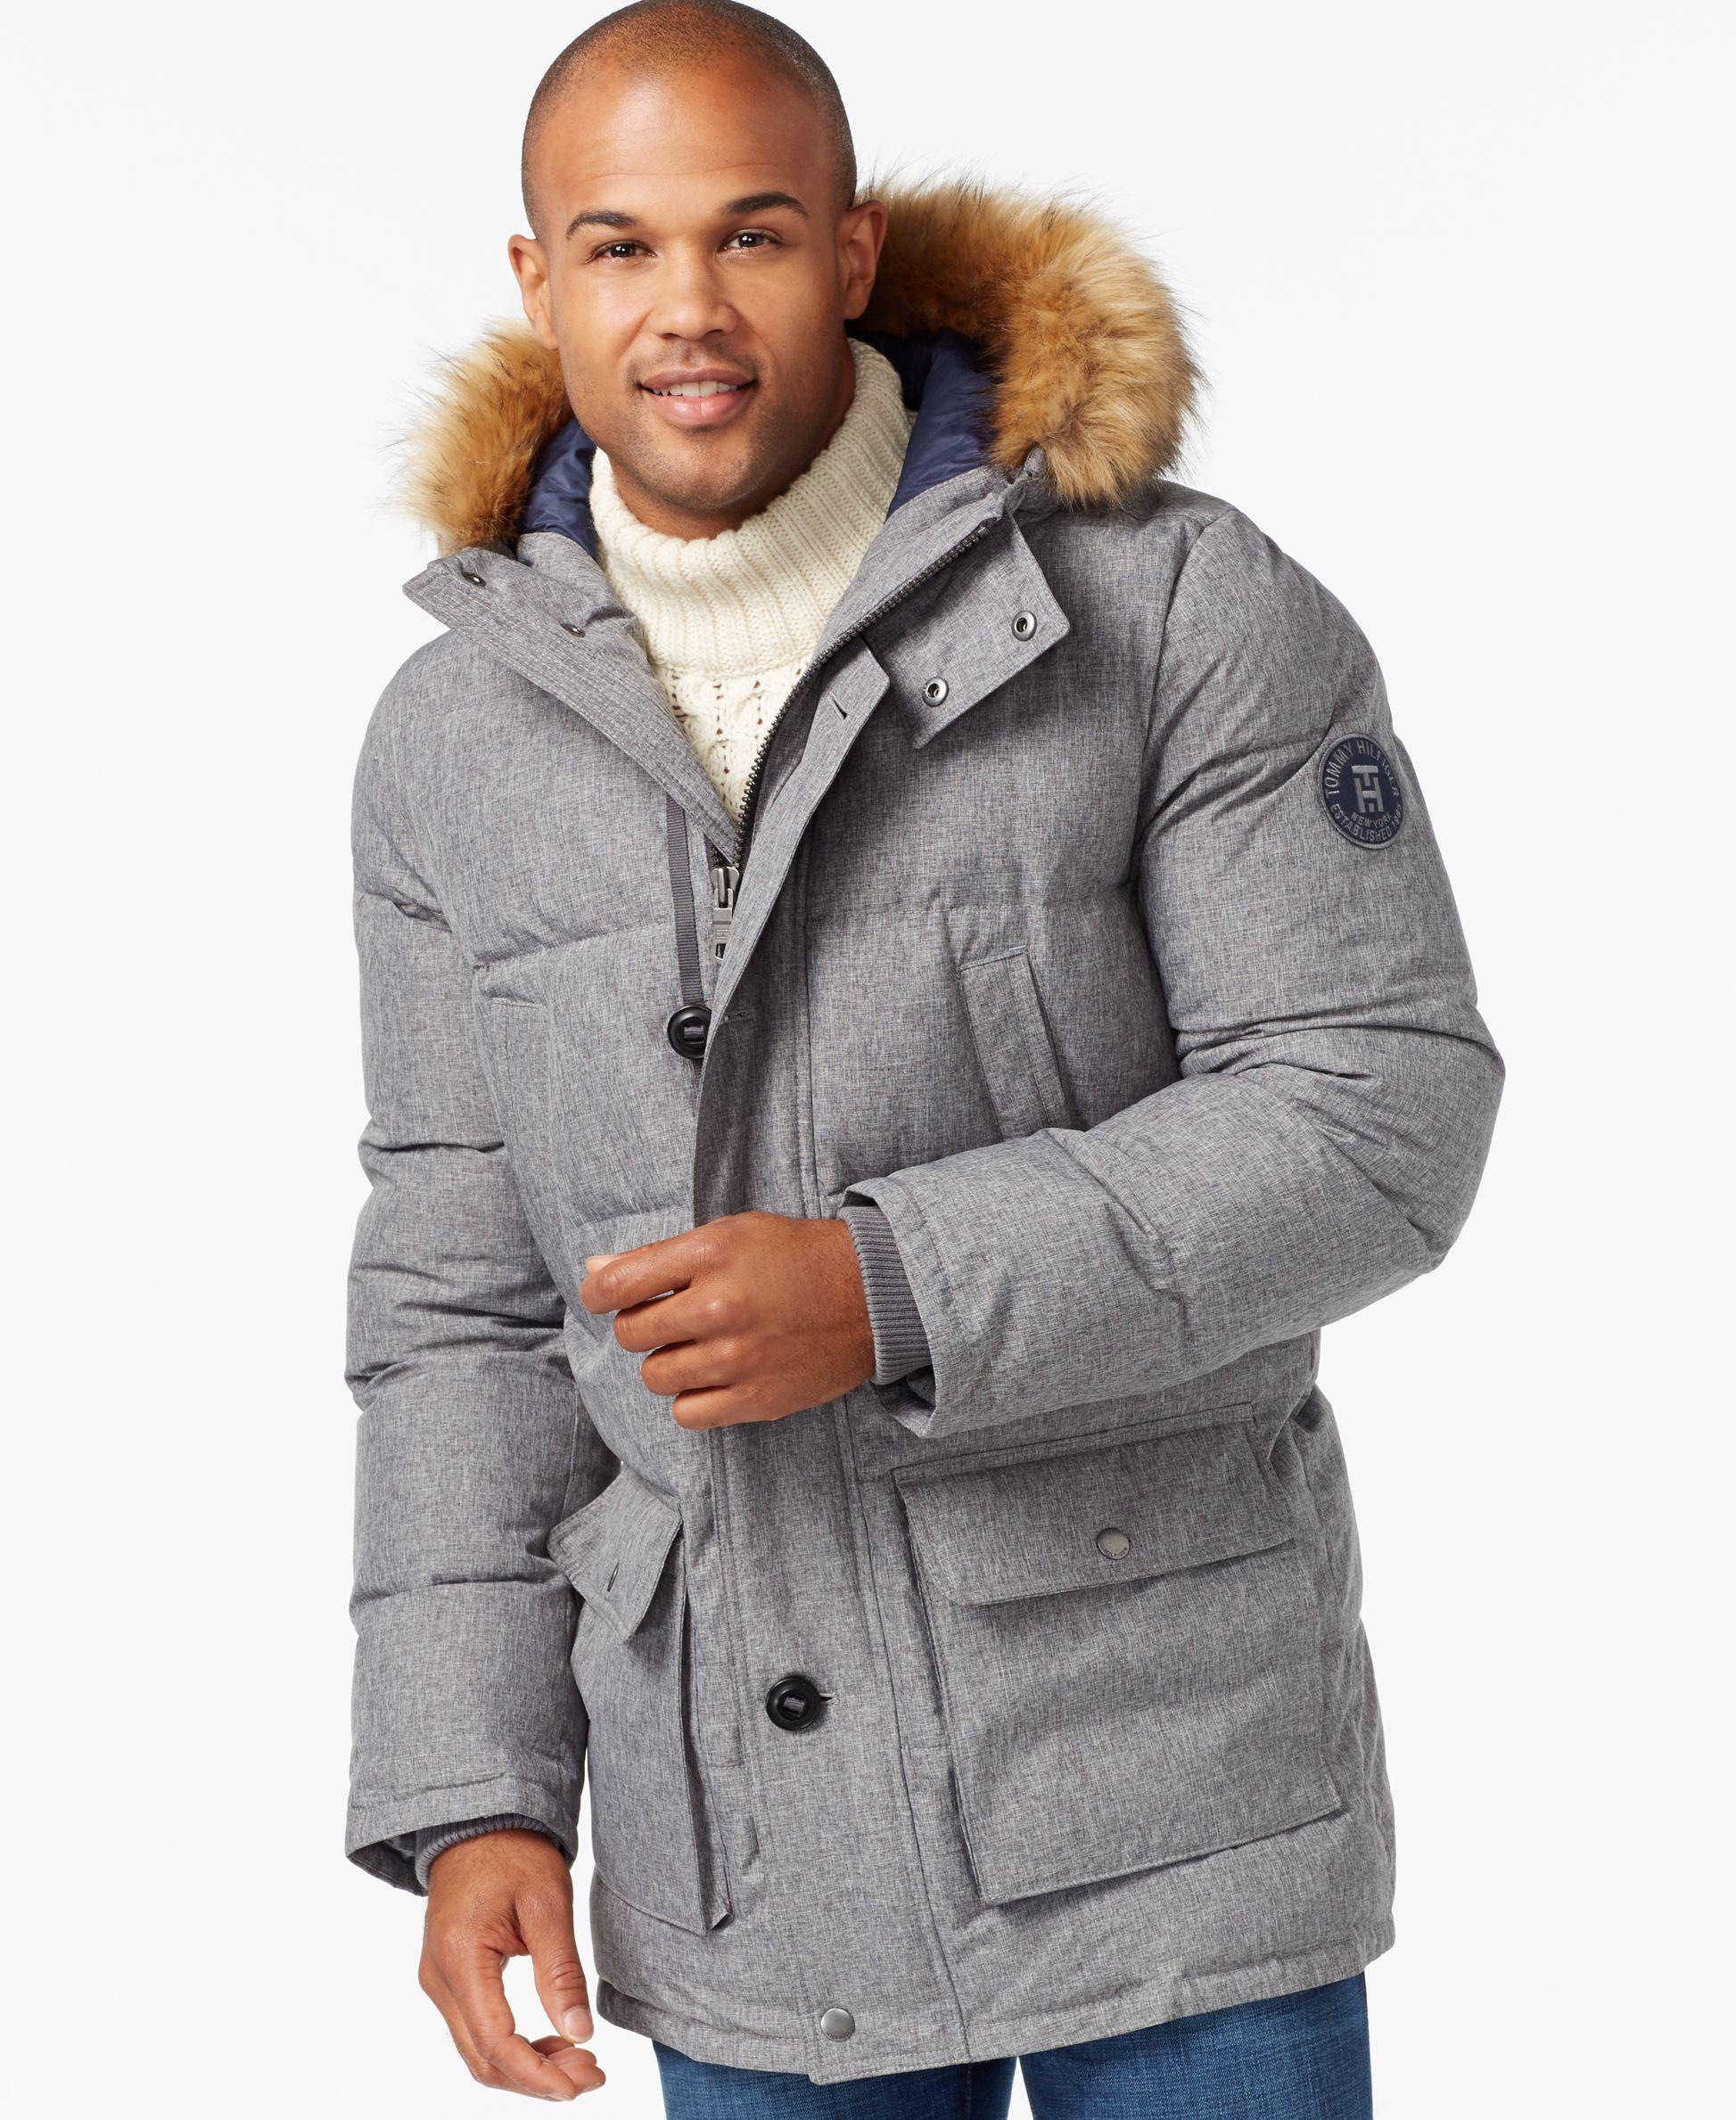 58db7547a Long Snorkel Coat | Men's styles | Tommy hilfiger jackets, Tommy ...